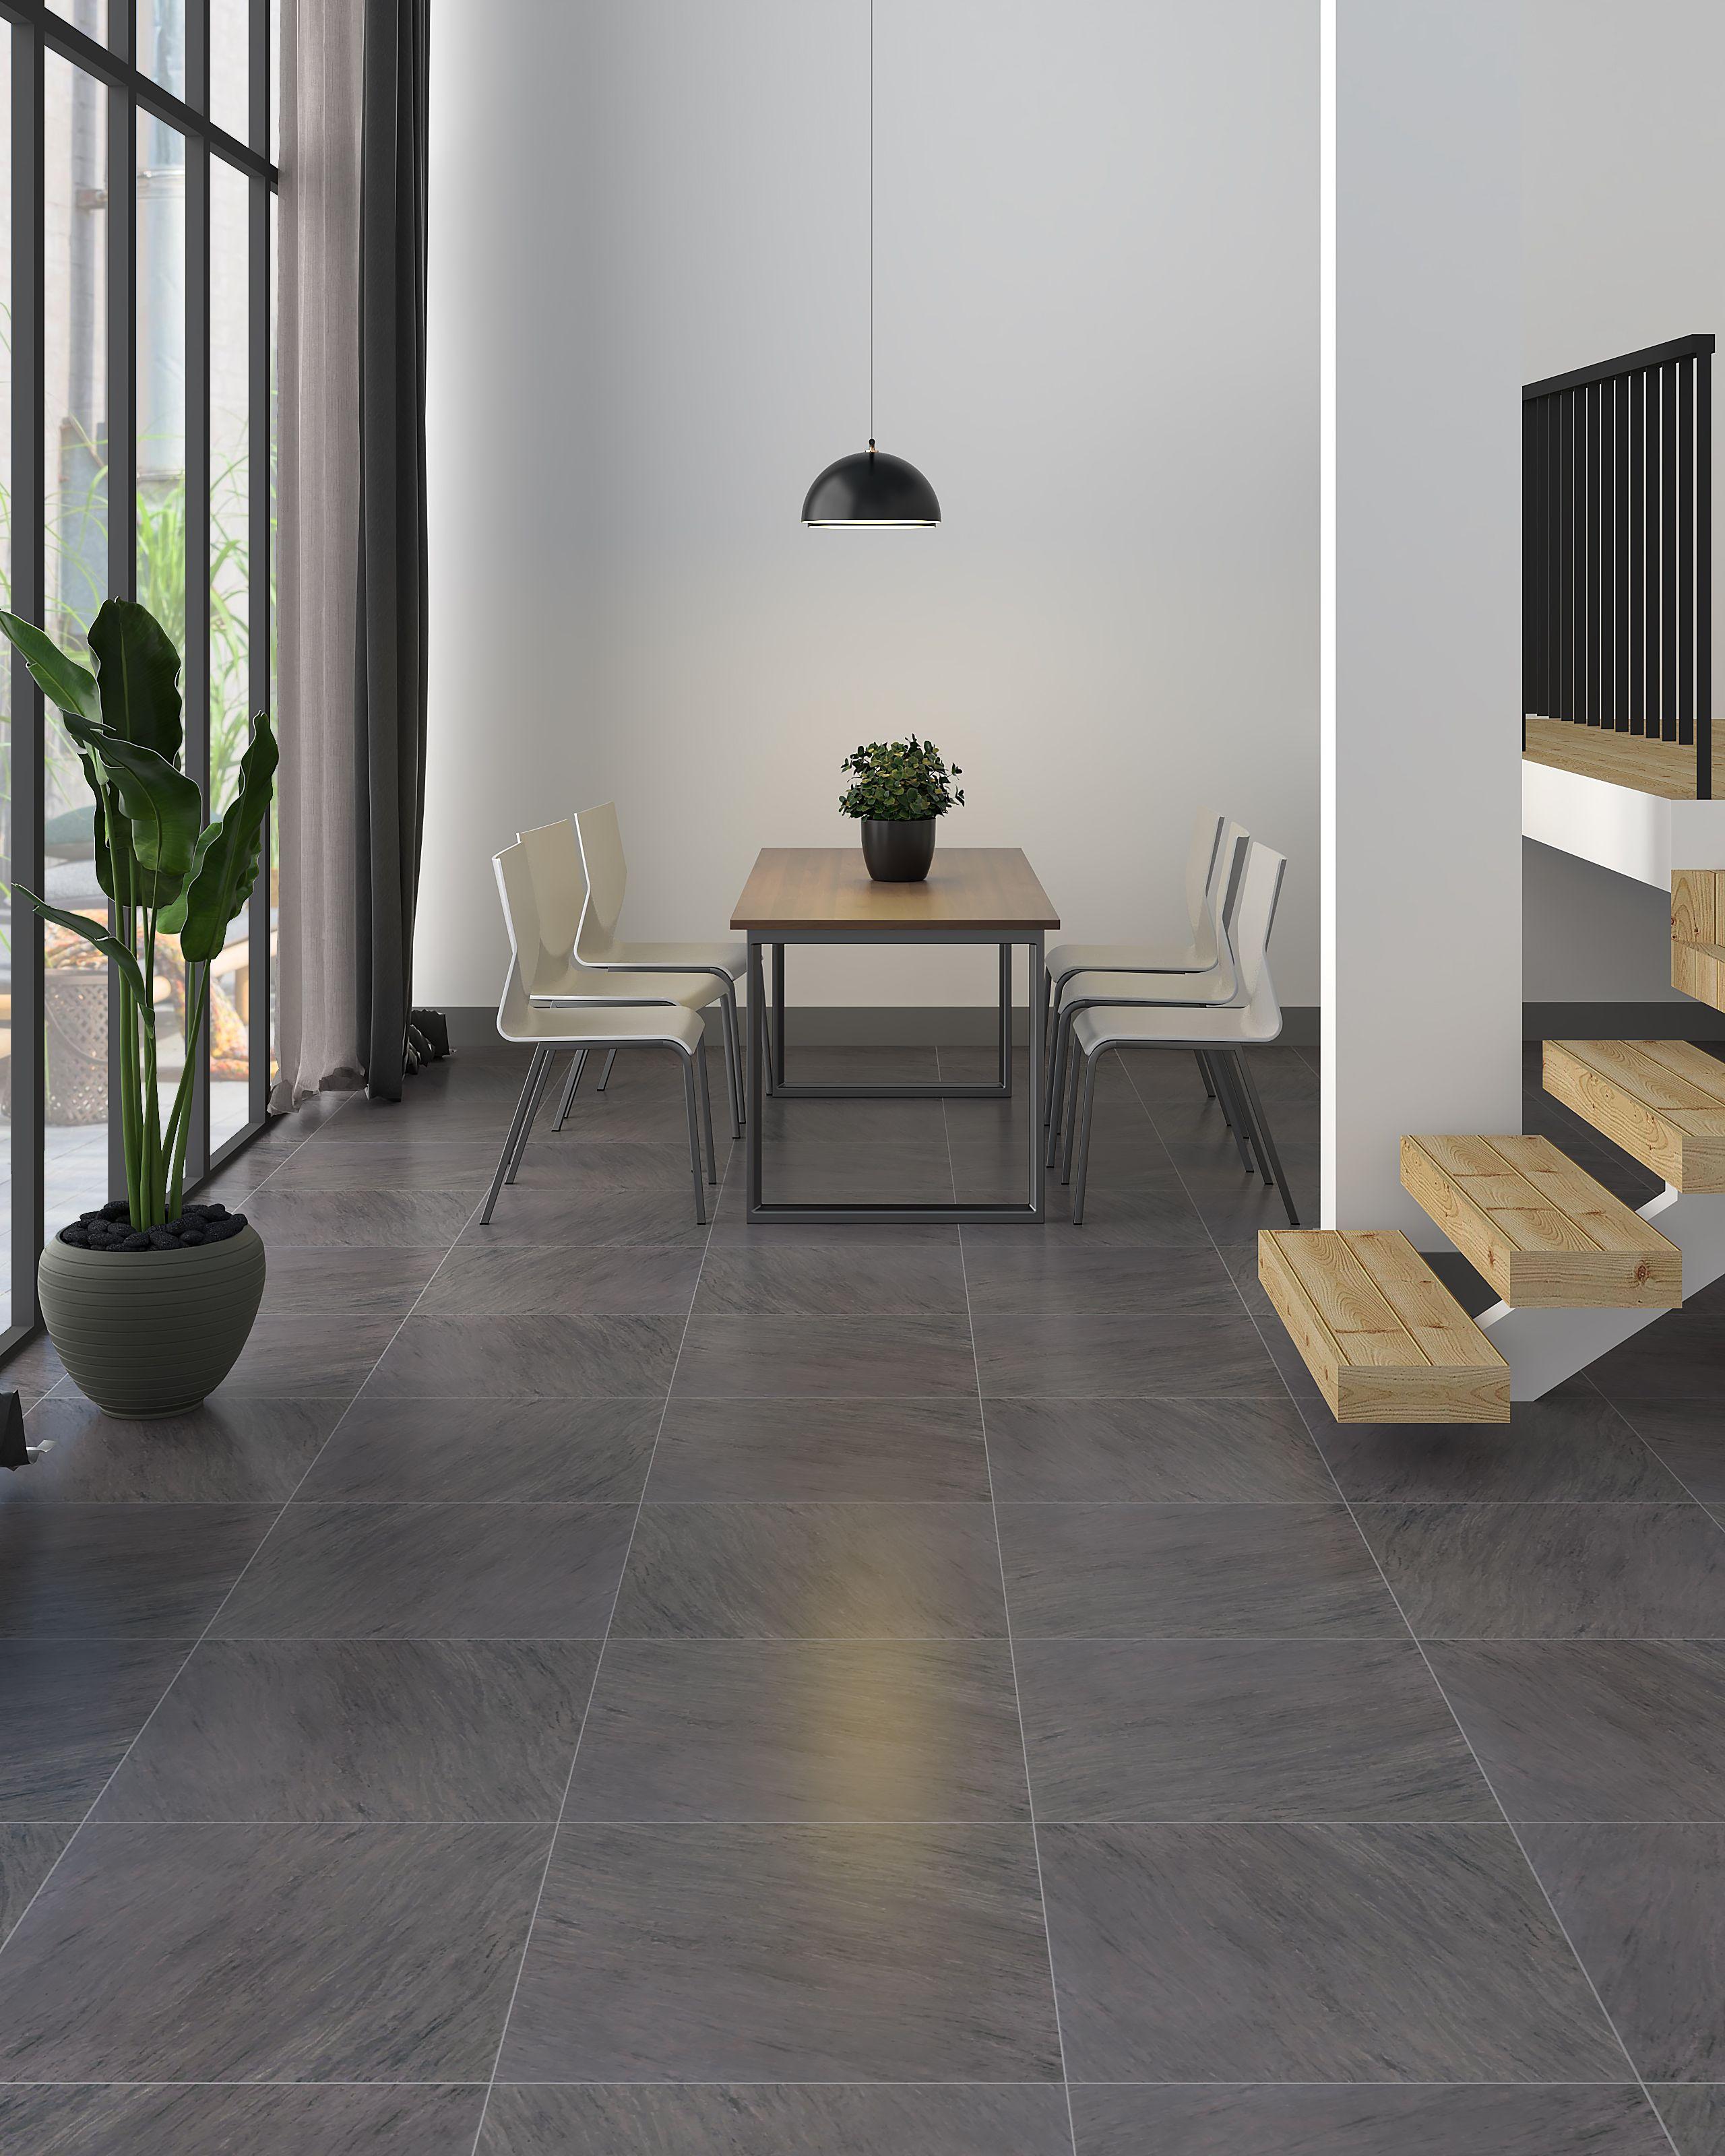 Floor Tile Java Darkgrey Matt By A Decor Grey Floor Tiles Living Room Living Room Tiles Grey Tiles Living Room